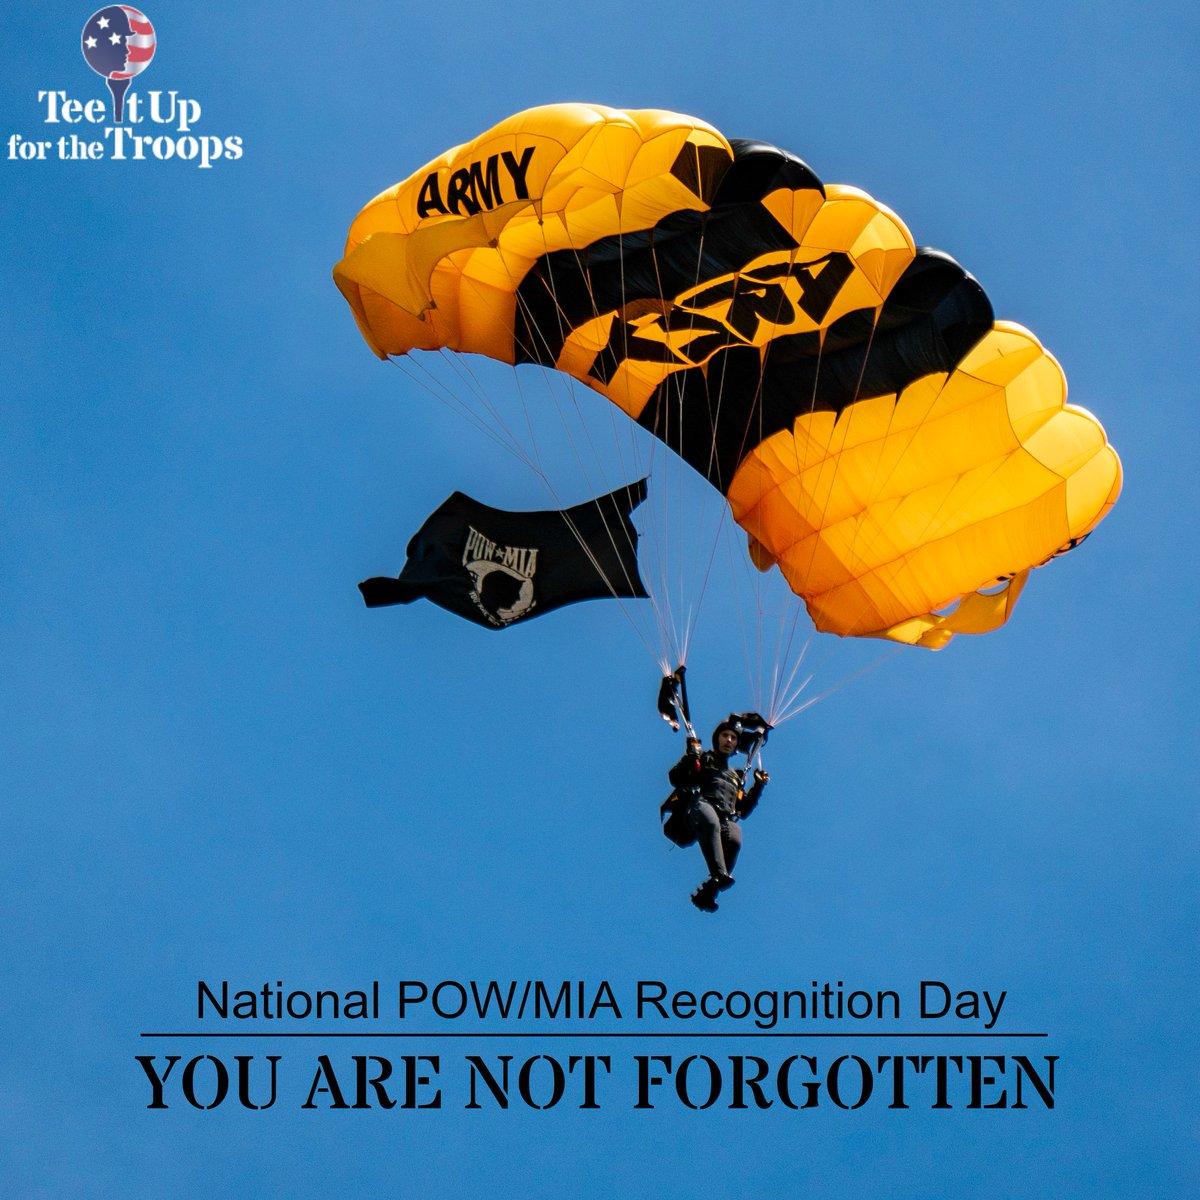 #POWMIA #NeverForgotten #HONOR #remember